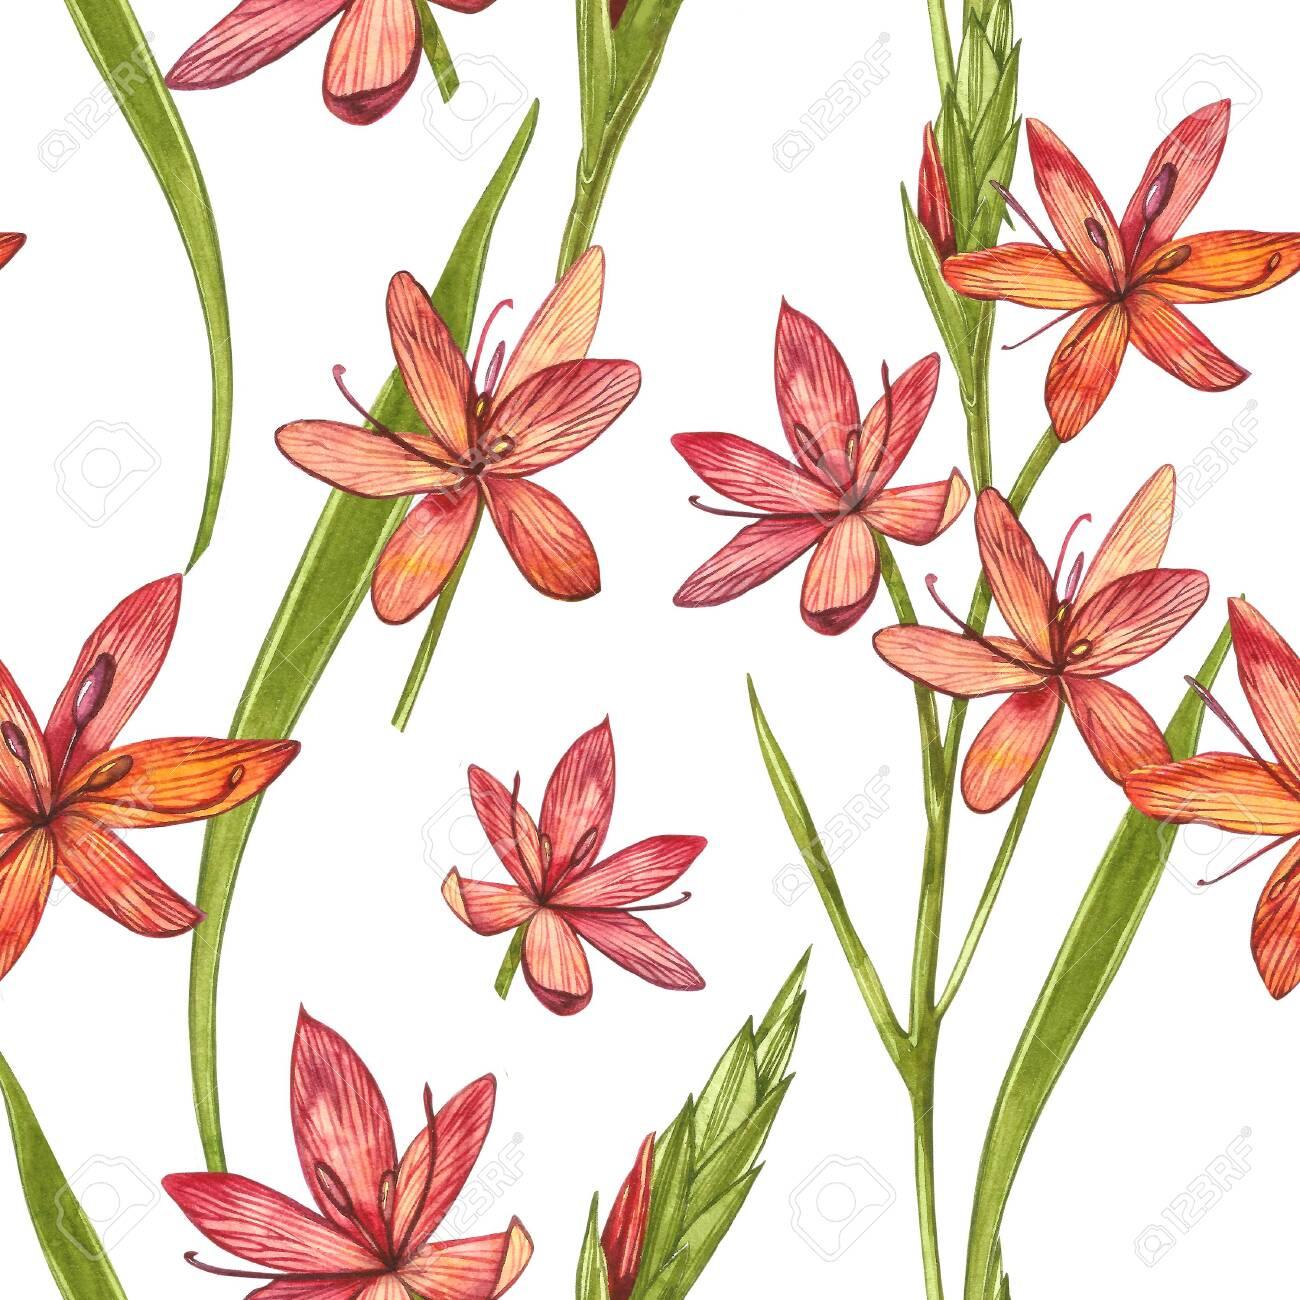 Kafir Lilies Flowers Seamless Patterns Collection Of Hand Drawn